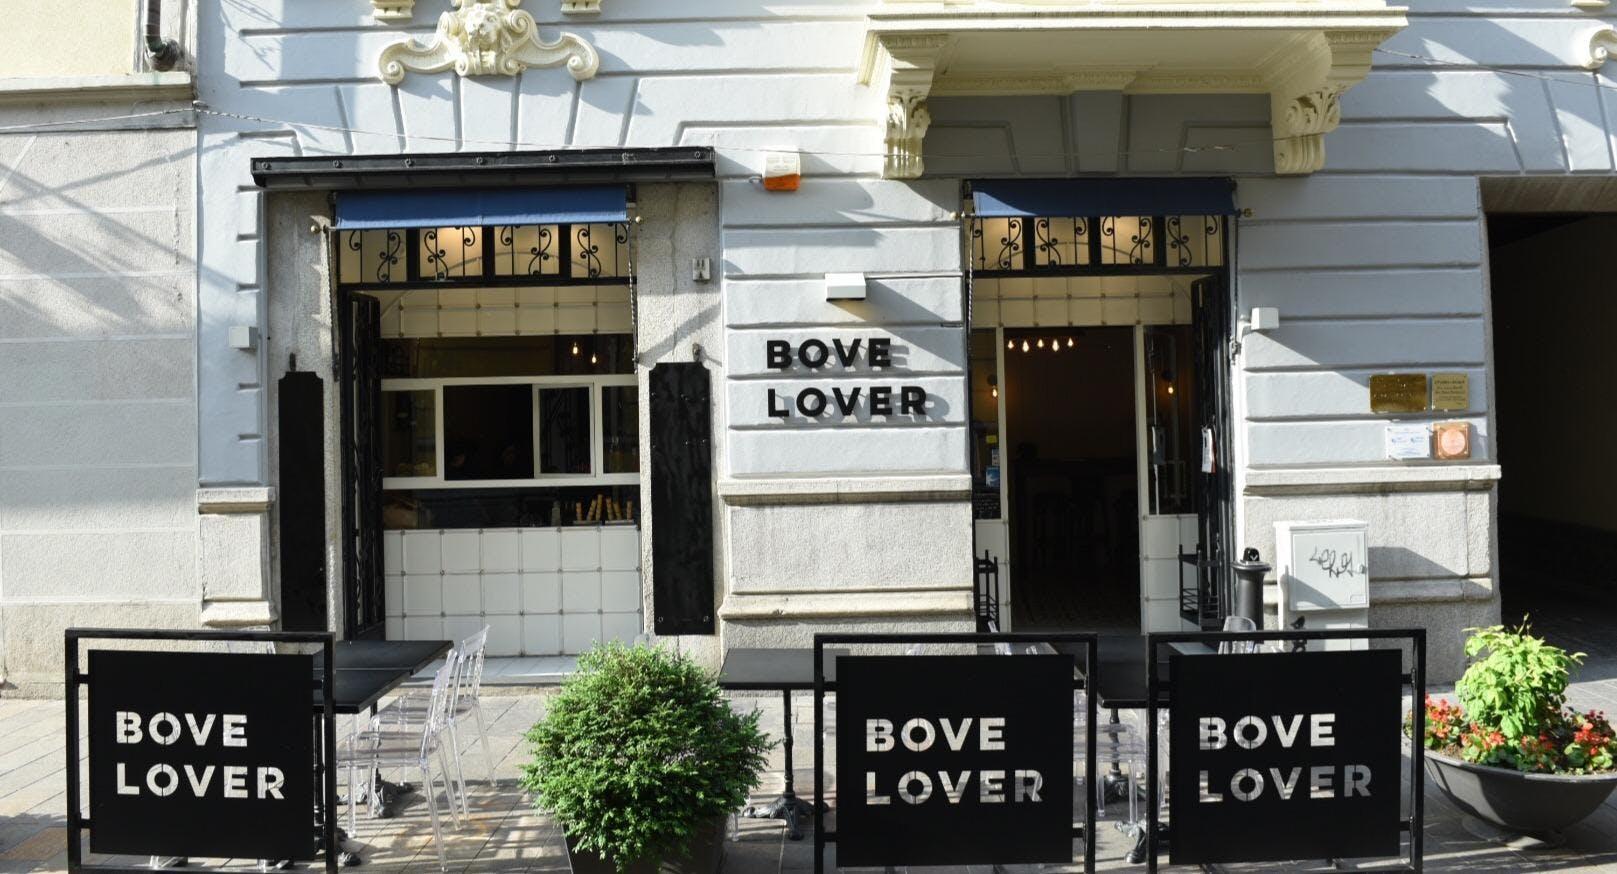 Bove Lover Monza and Brianza image 3